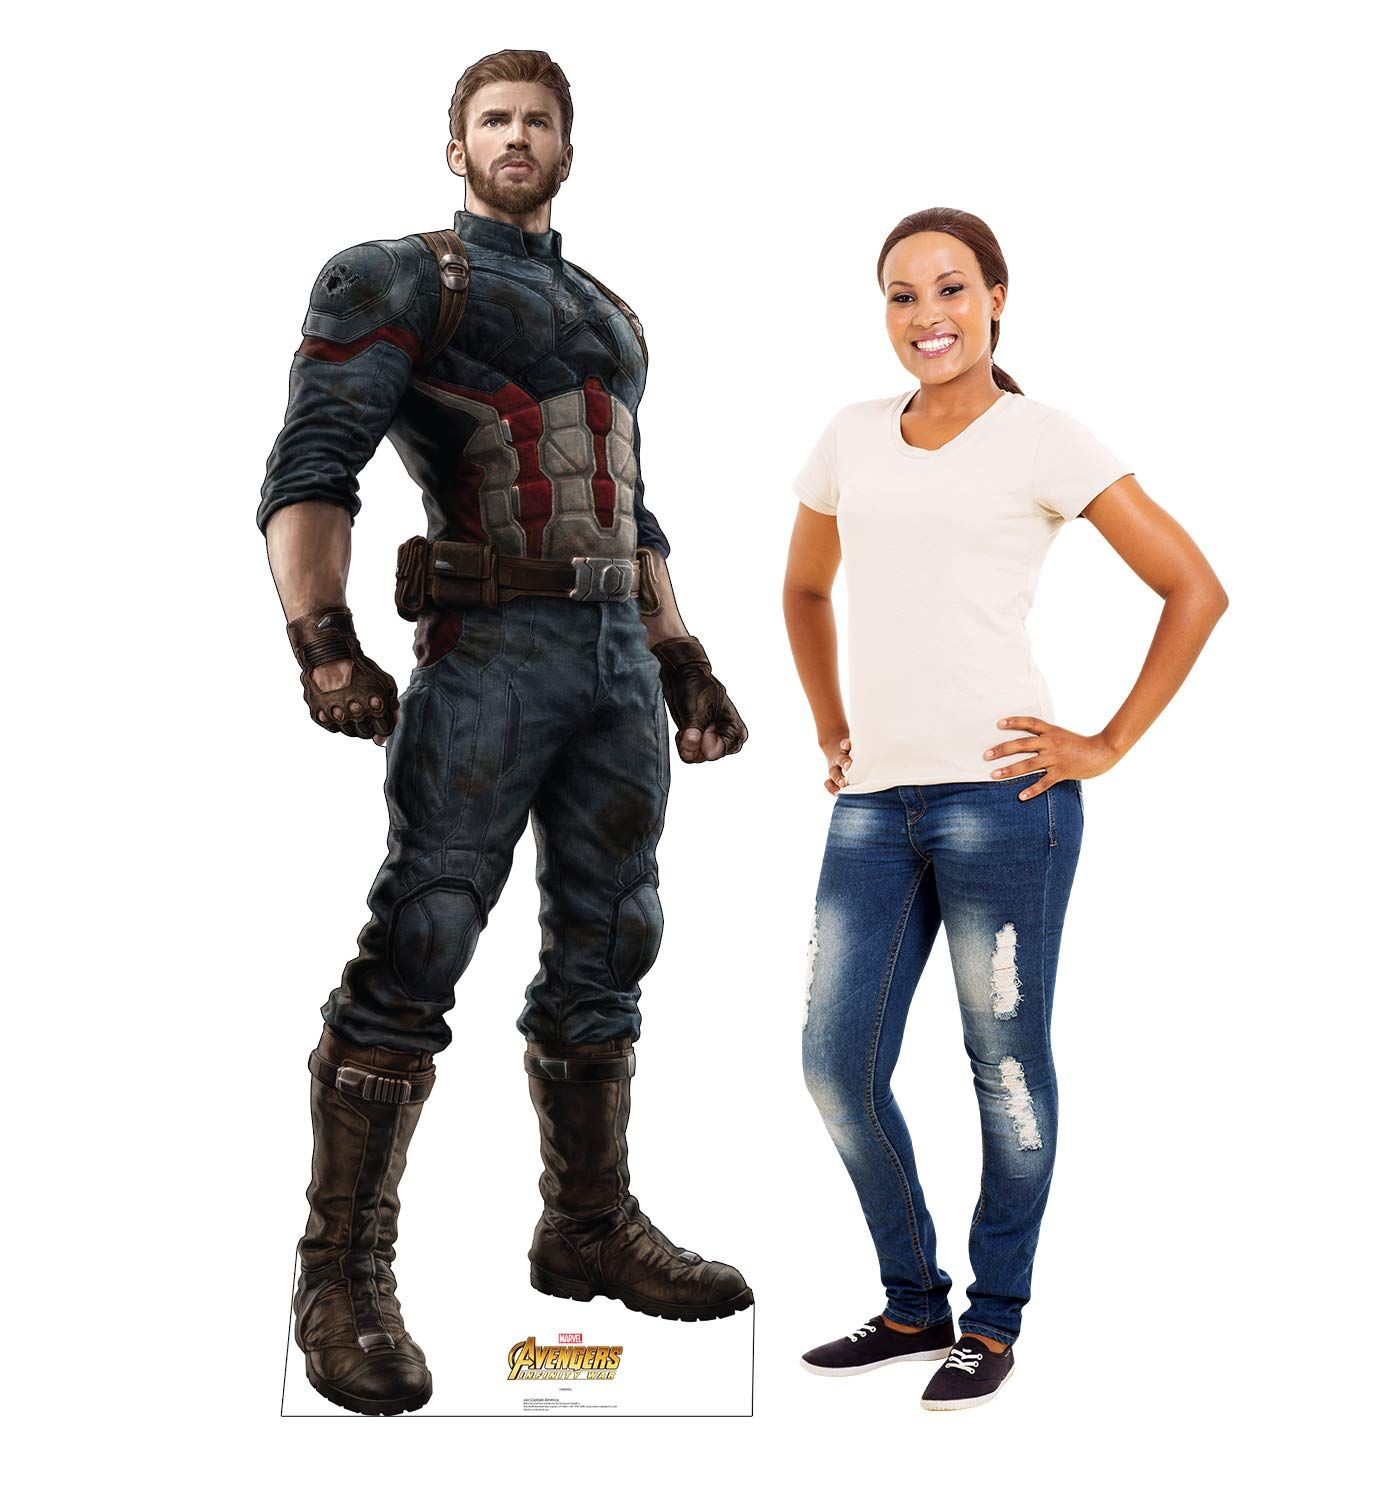 Advanced Graphics Captain Marvel Life Size Cardboard Cutout Standup 2019 Film Captain Marvel